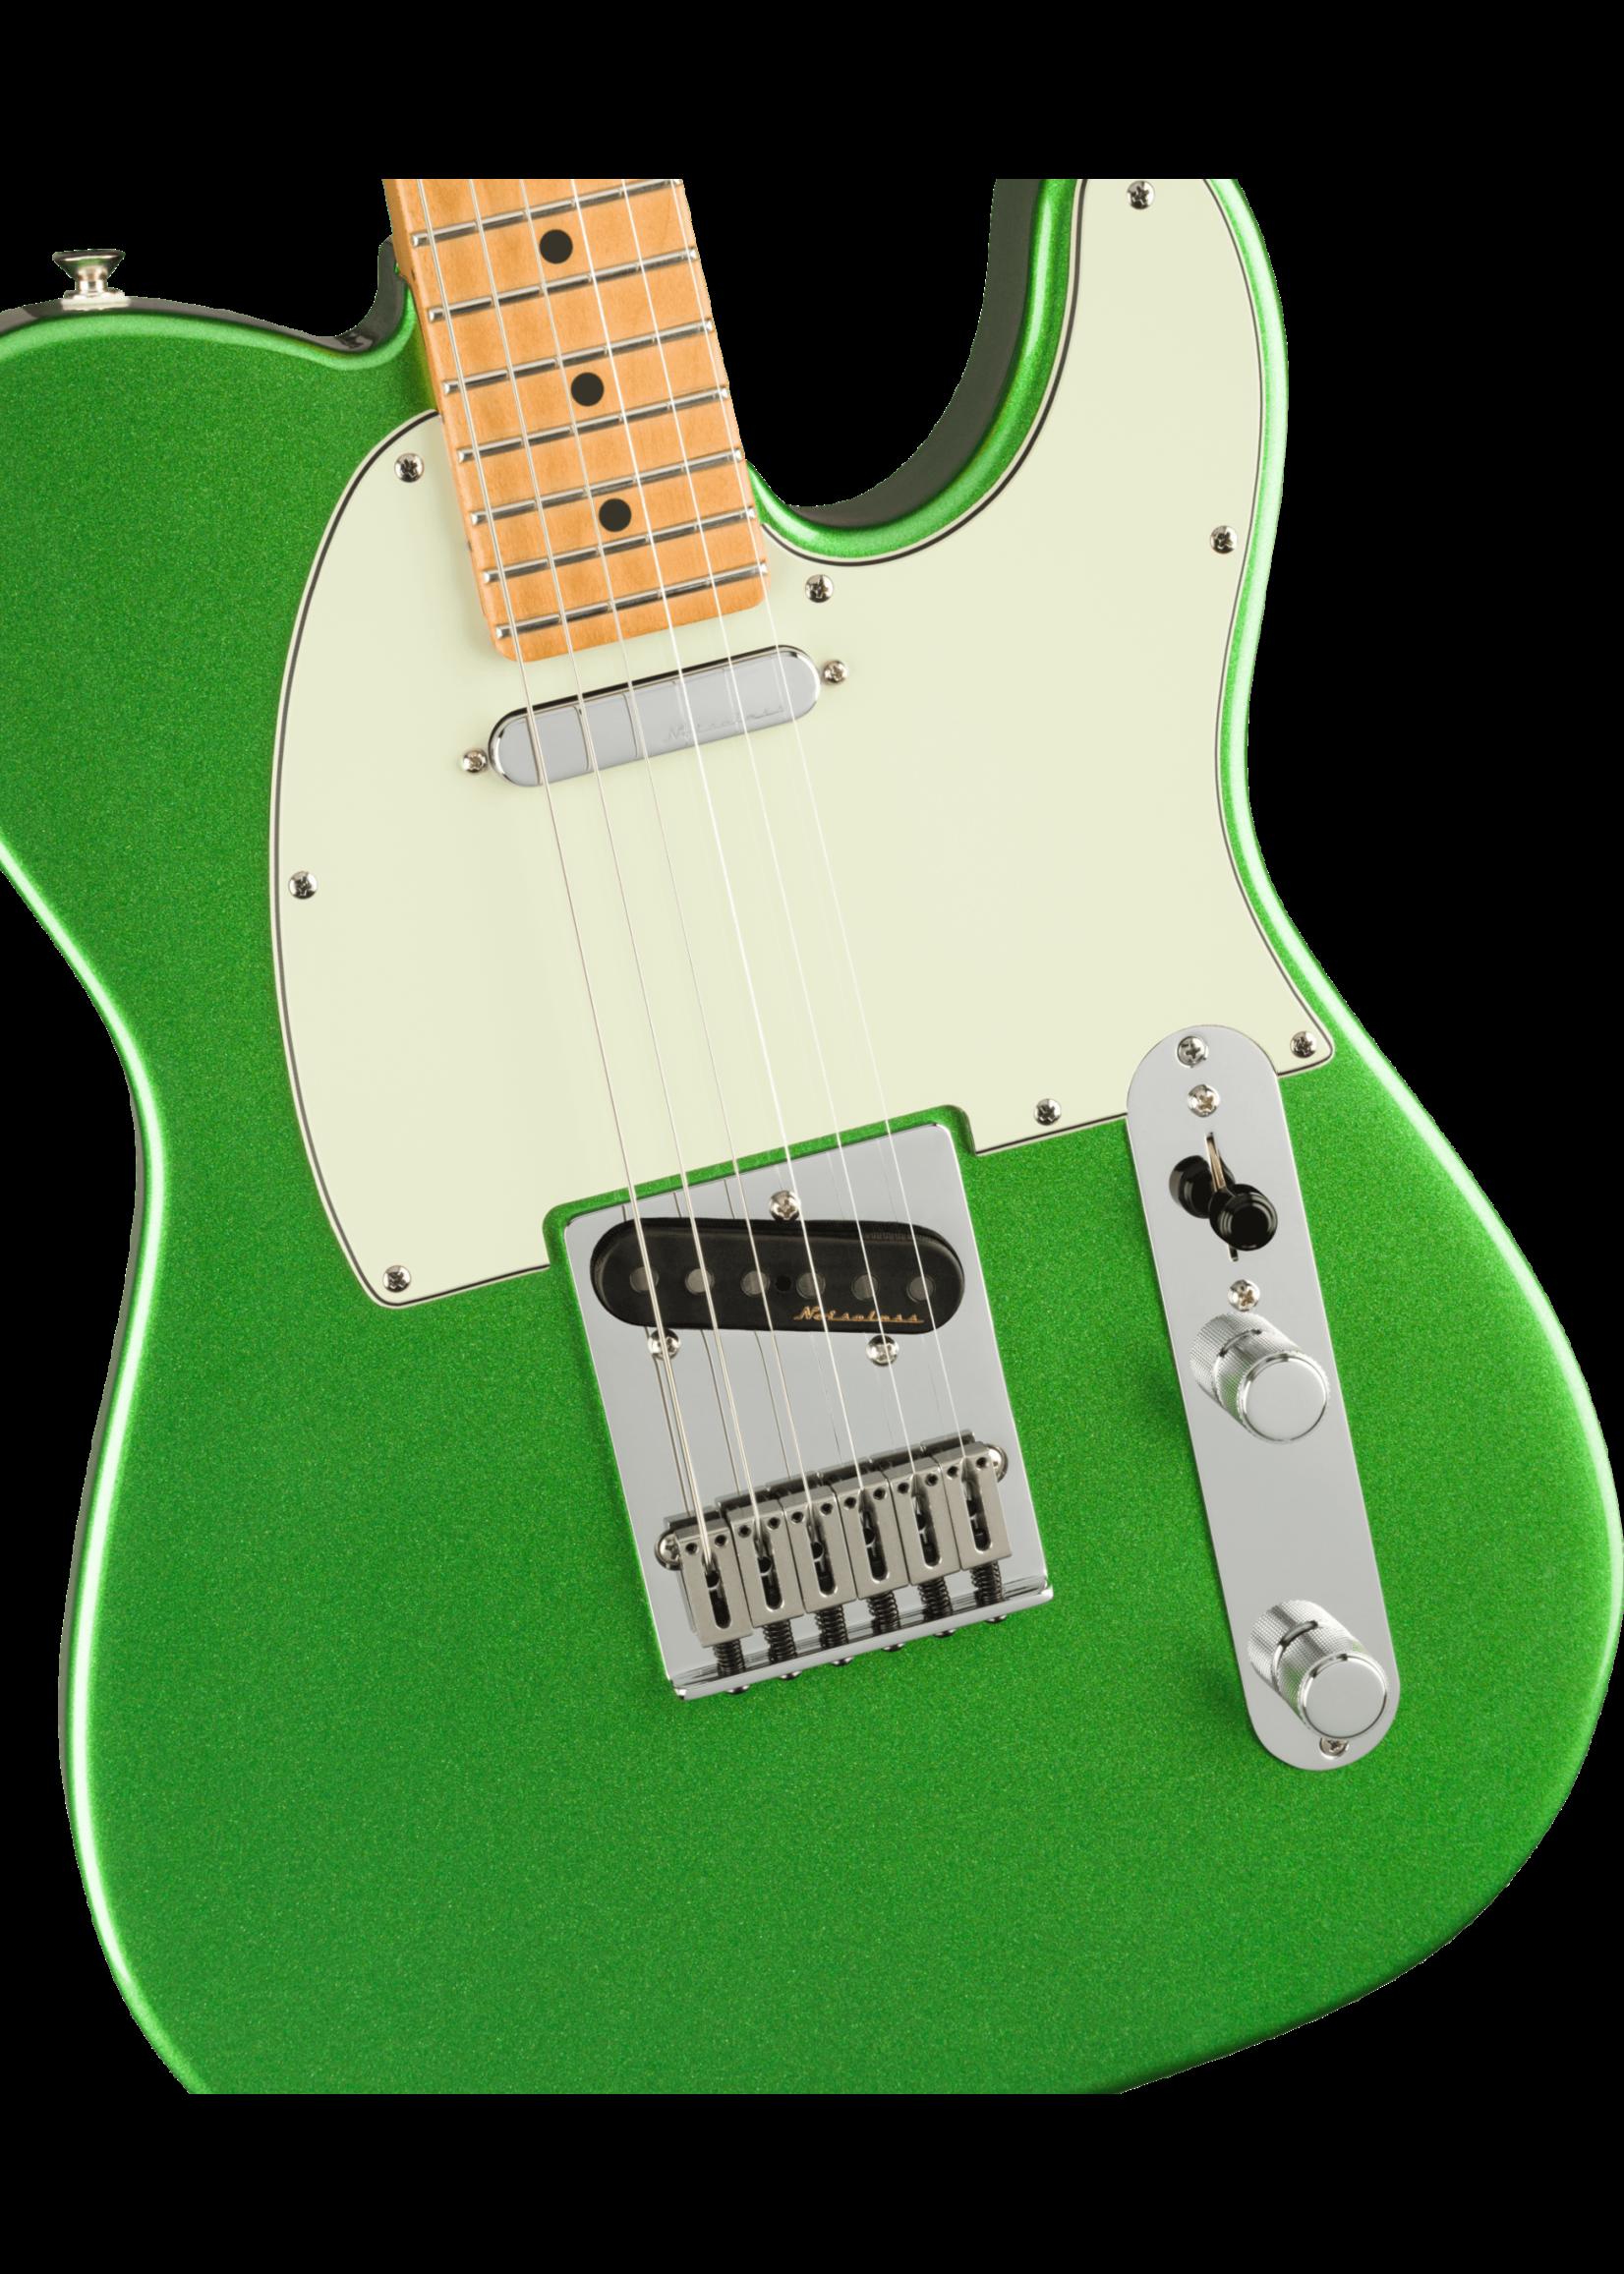 Fender Fender Player Plus Telecaster Maple Fingerboard Cosmic Jade